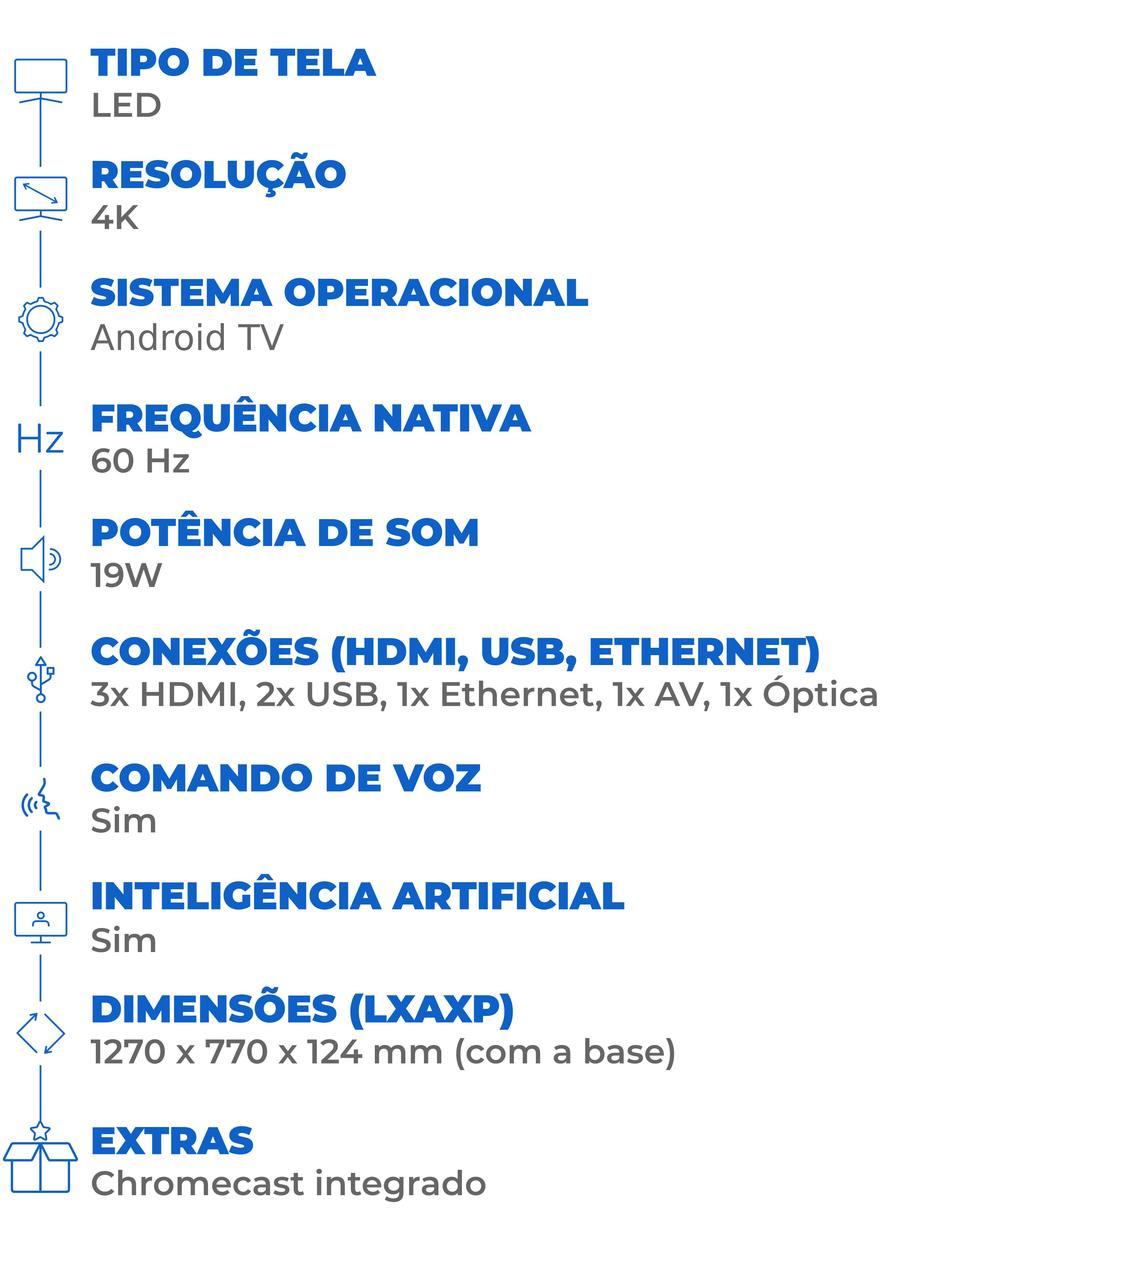 Ficha técnica da smart TV TCL P615